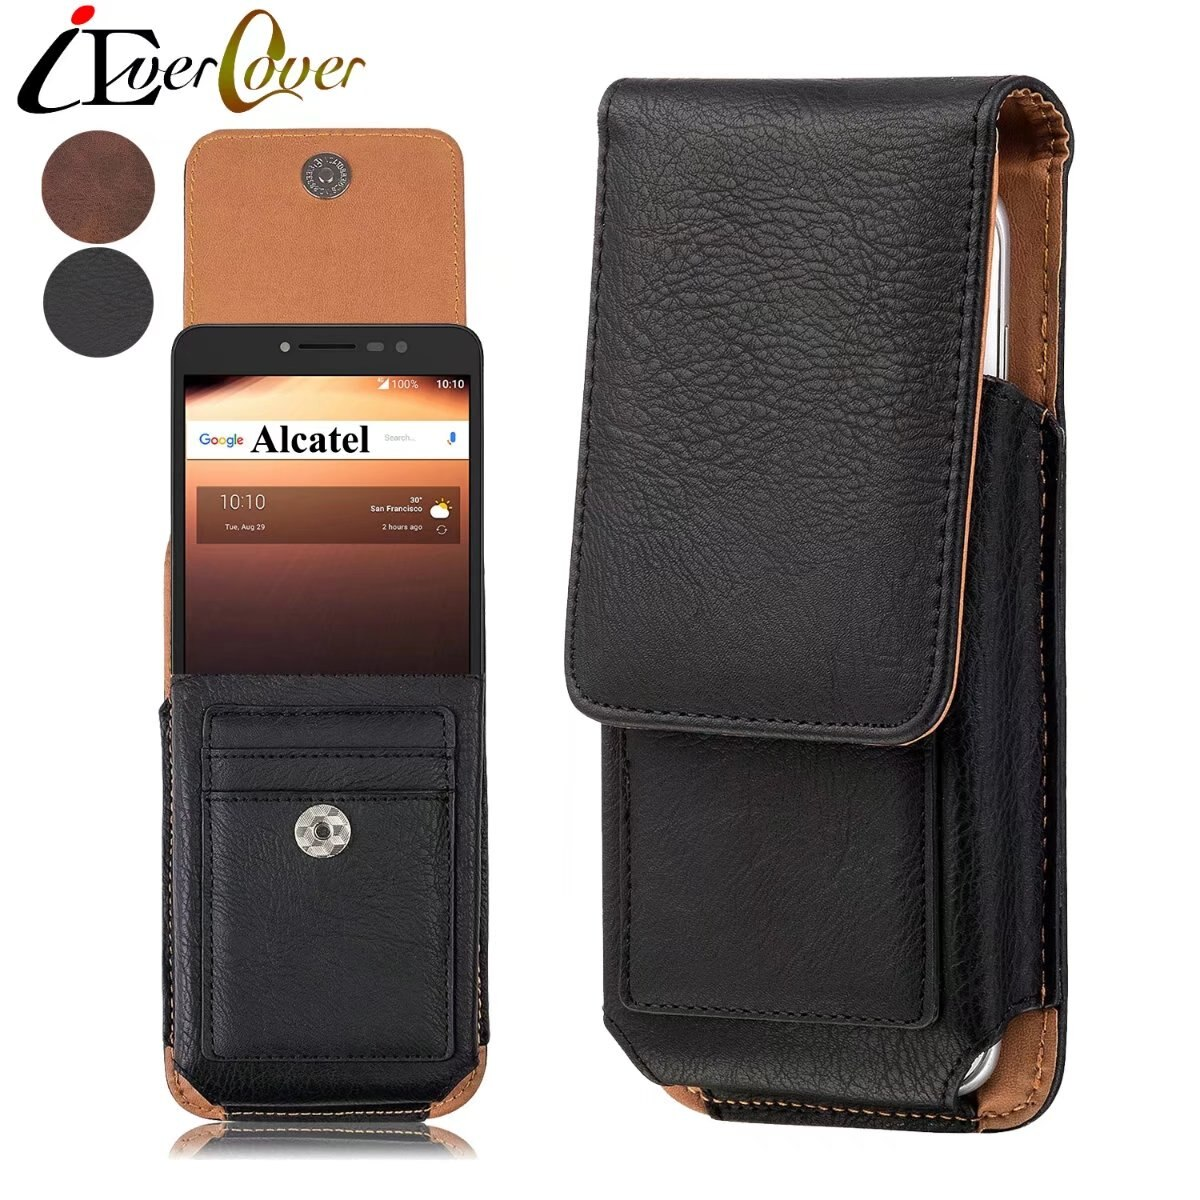 Premium Vertical Leather Case Holster Cover w/ Swivel Belt Clip for Alcatel A3 XL , Pixi Theatre , Pixi 4(6inch) 4G Phone Pouch